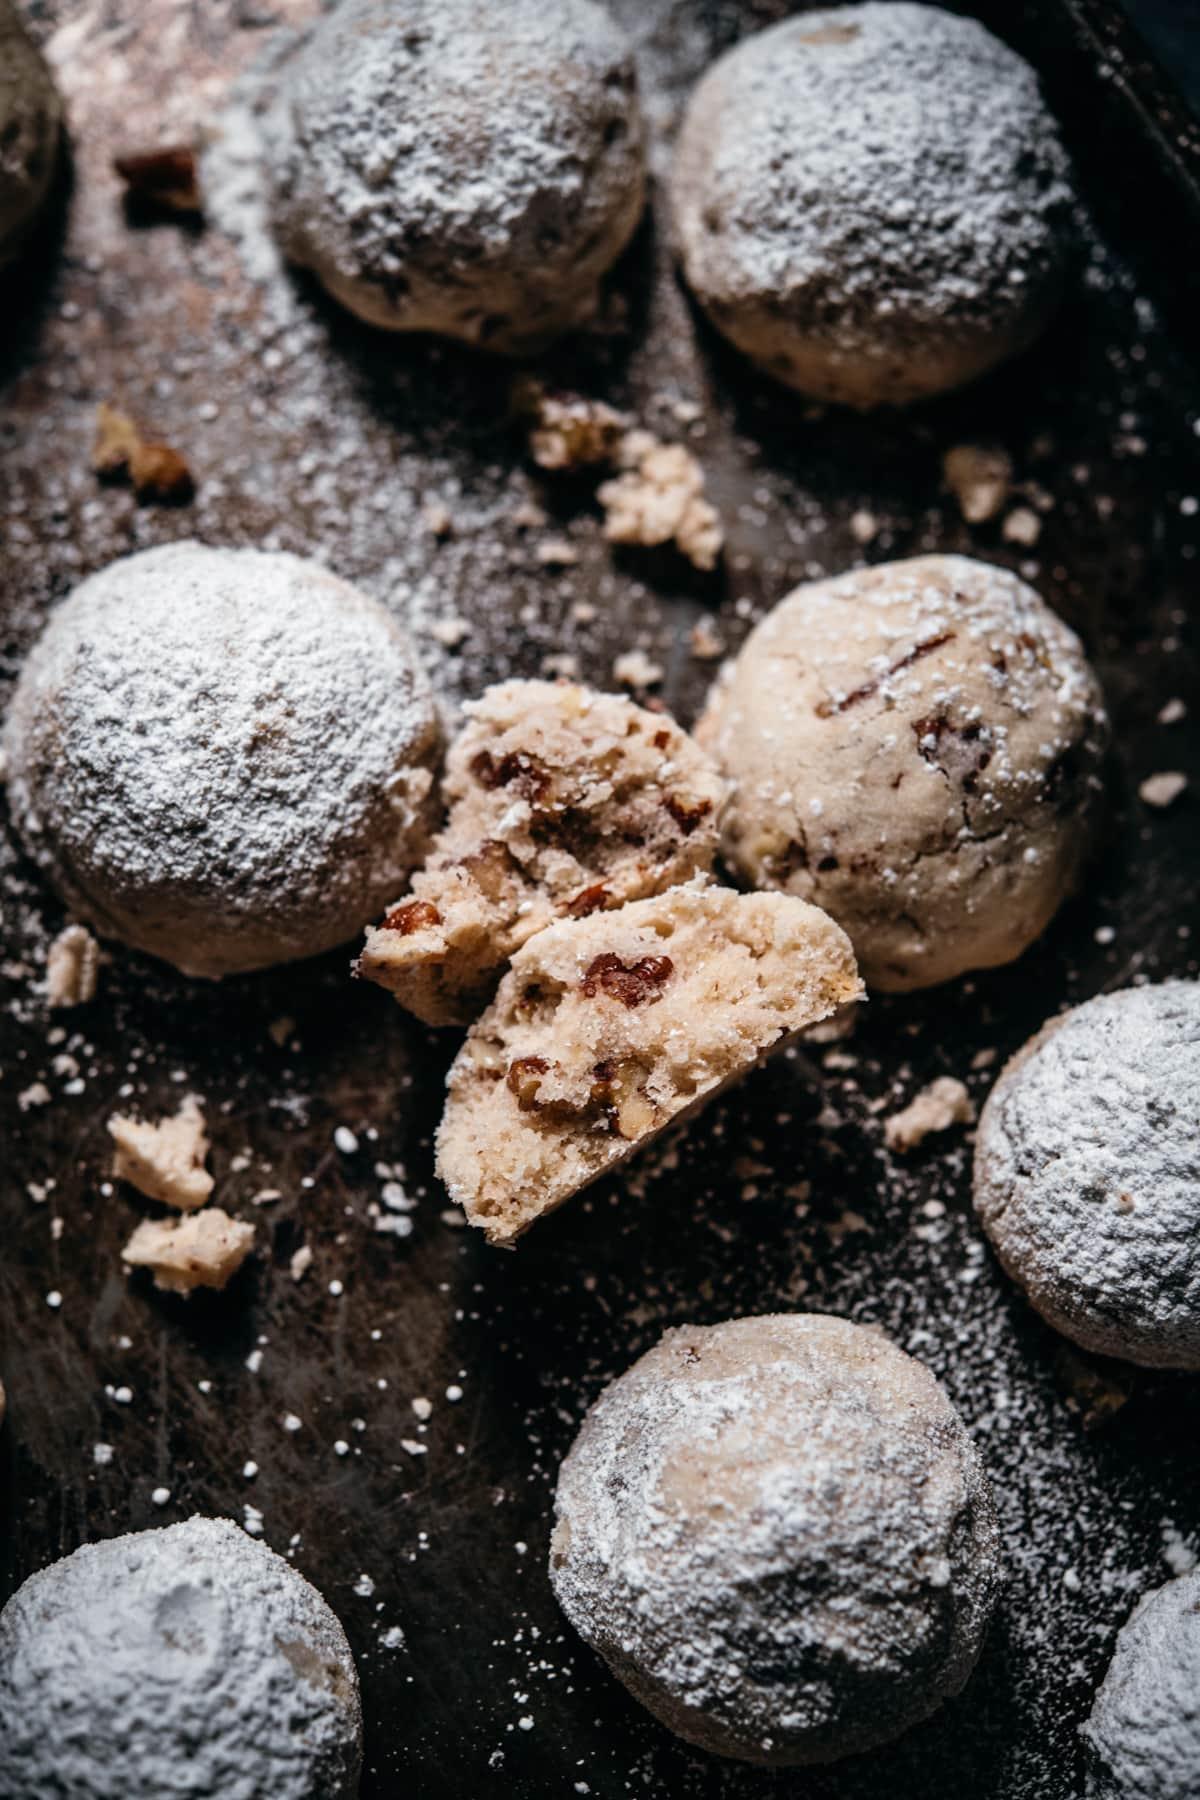 vegan and gluten free pecan snowball cookies with one broken in half to show interior.